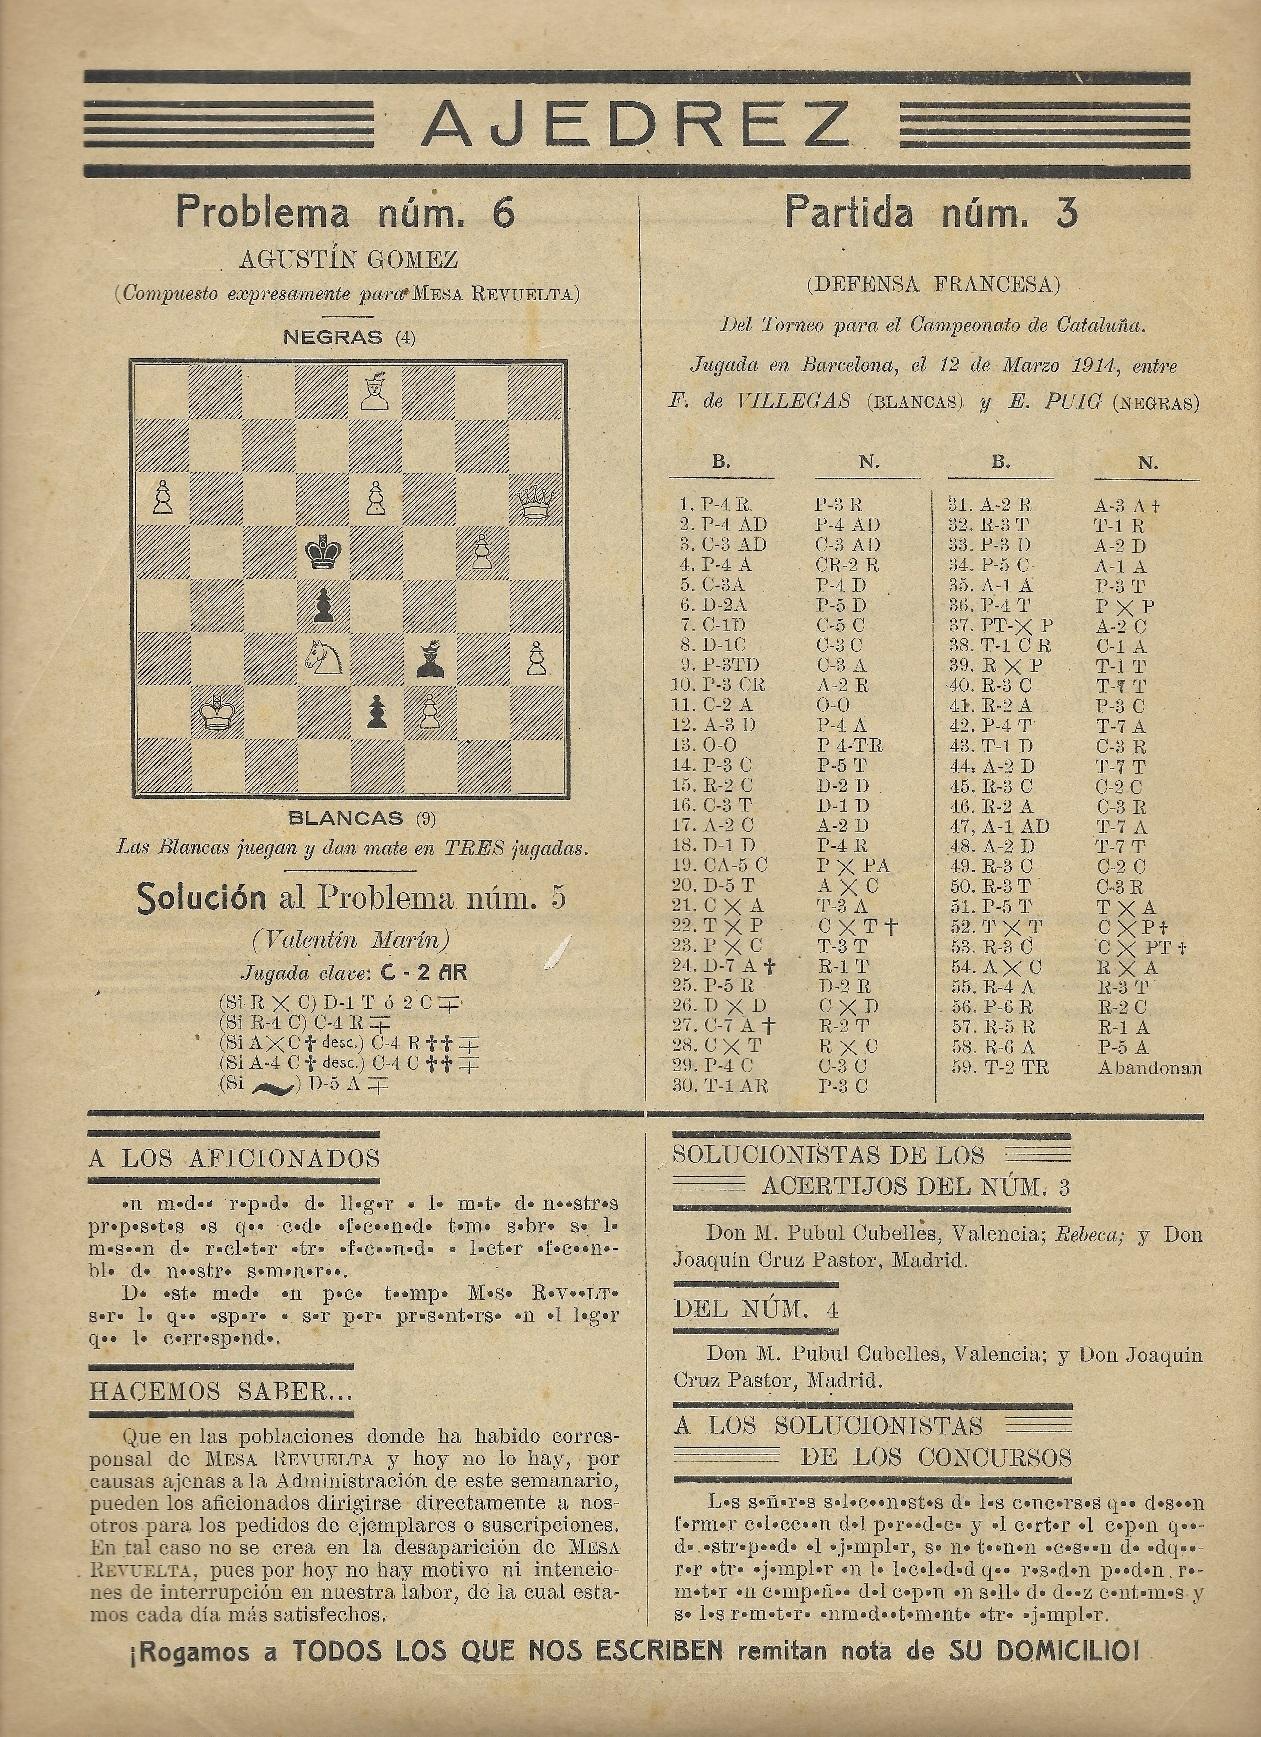 Revista Mesa Revuelta, número 6, 8 de agosto de 1915